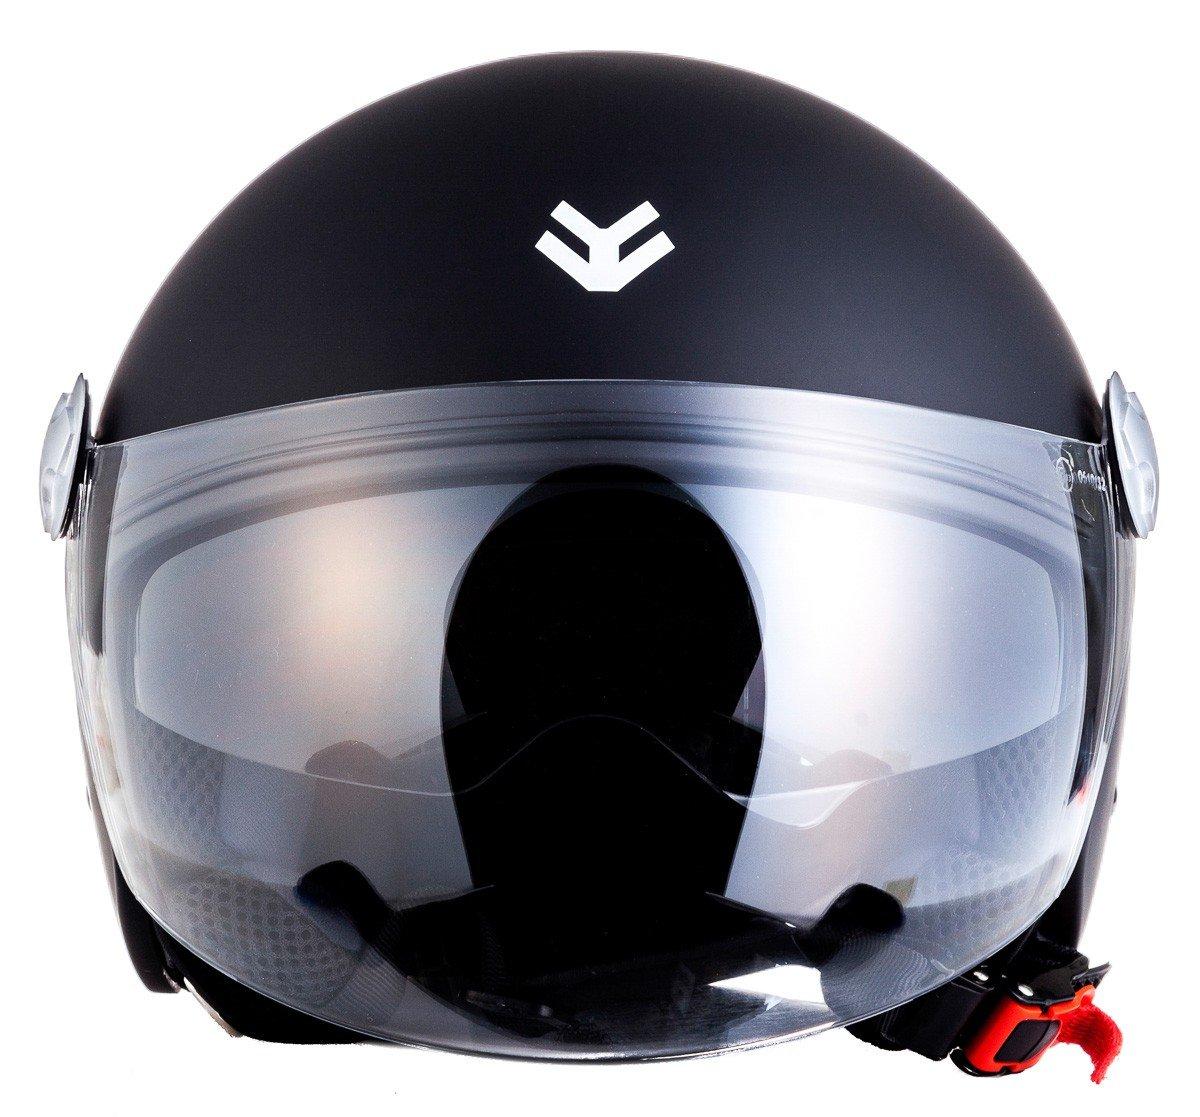 "/· Open Face Helmet /· Scooter Retro Motorcycle Pilot Jet Motorbike /· ECE certified /· Separate Visors /· Click-n-Secure Clip /· Carrier Bag /· XL 61-62cm red Armor /· AV-63 /""Fun Red/"""